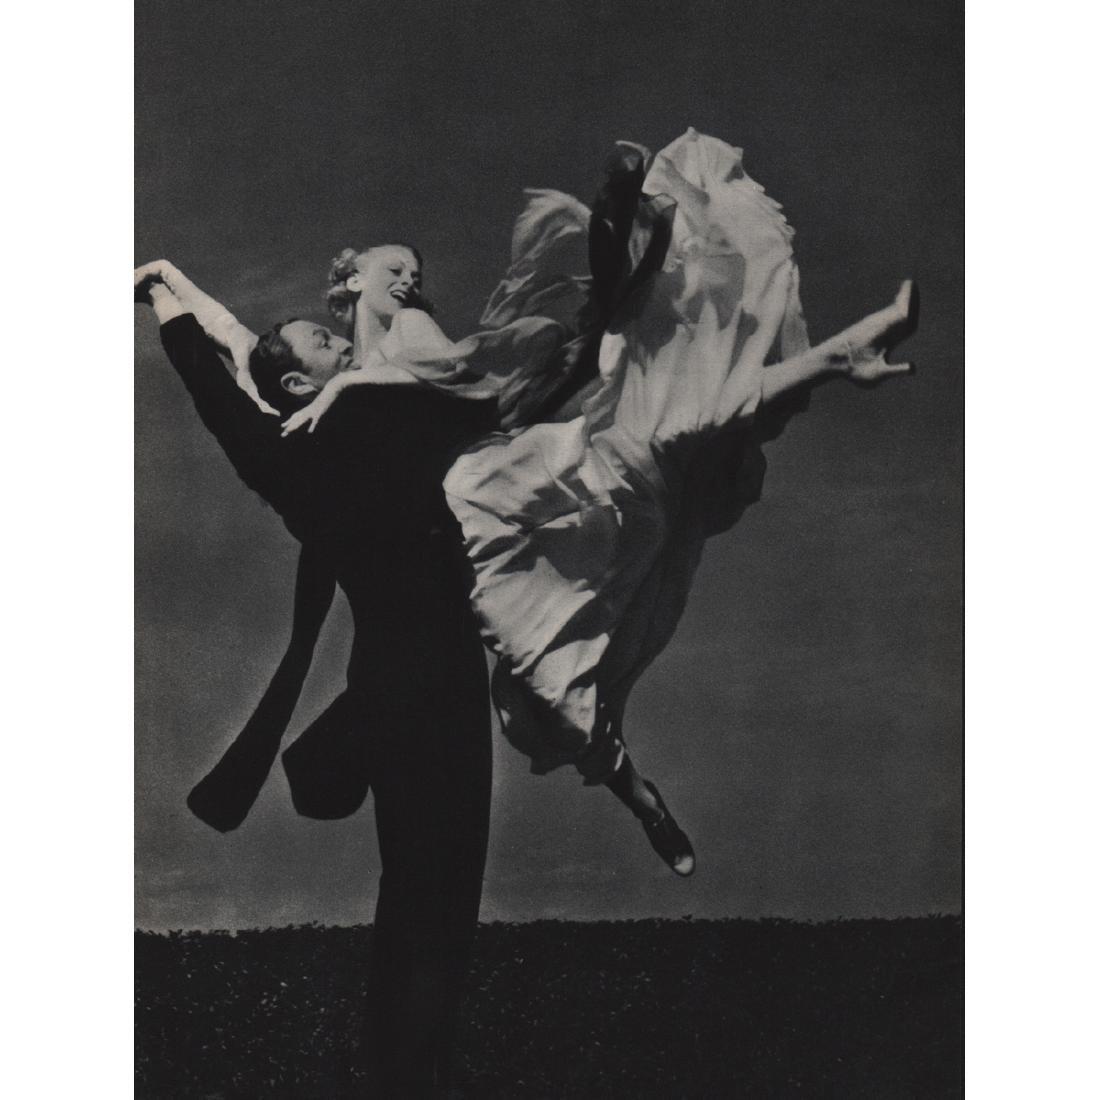 REMIE LOHSE - Dancers